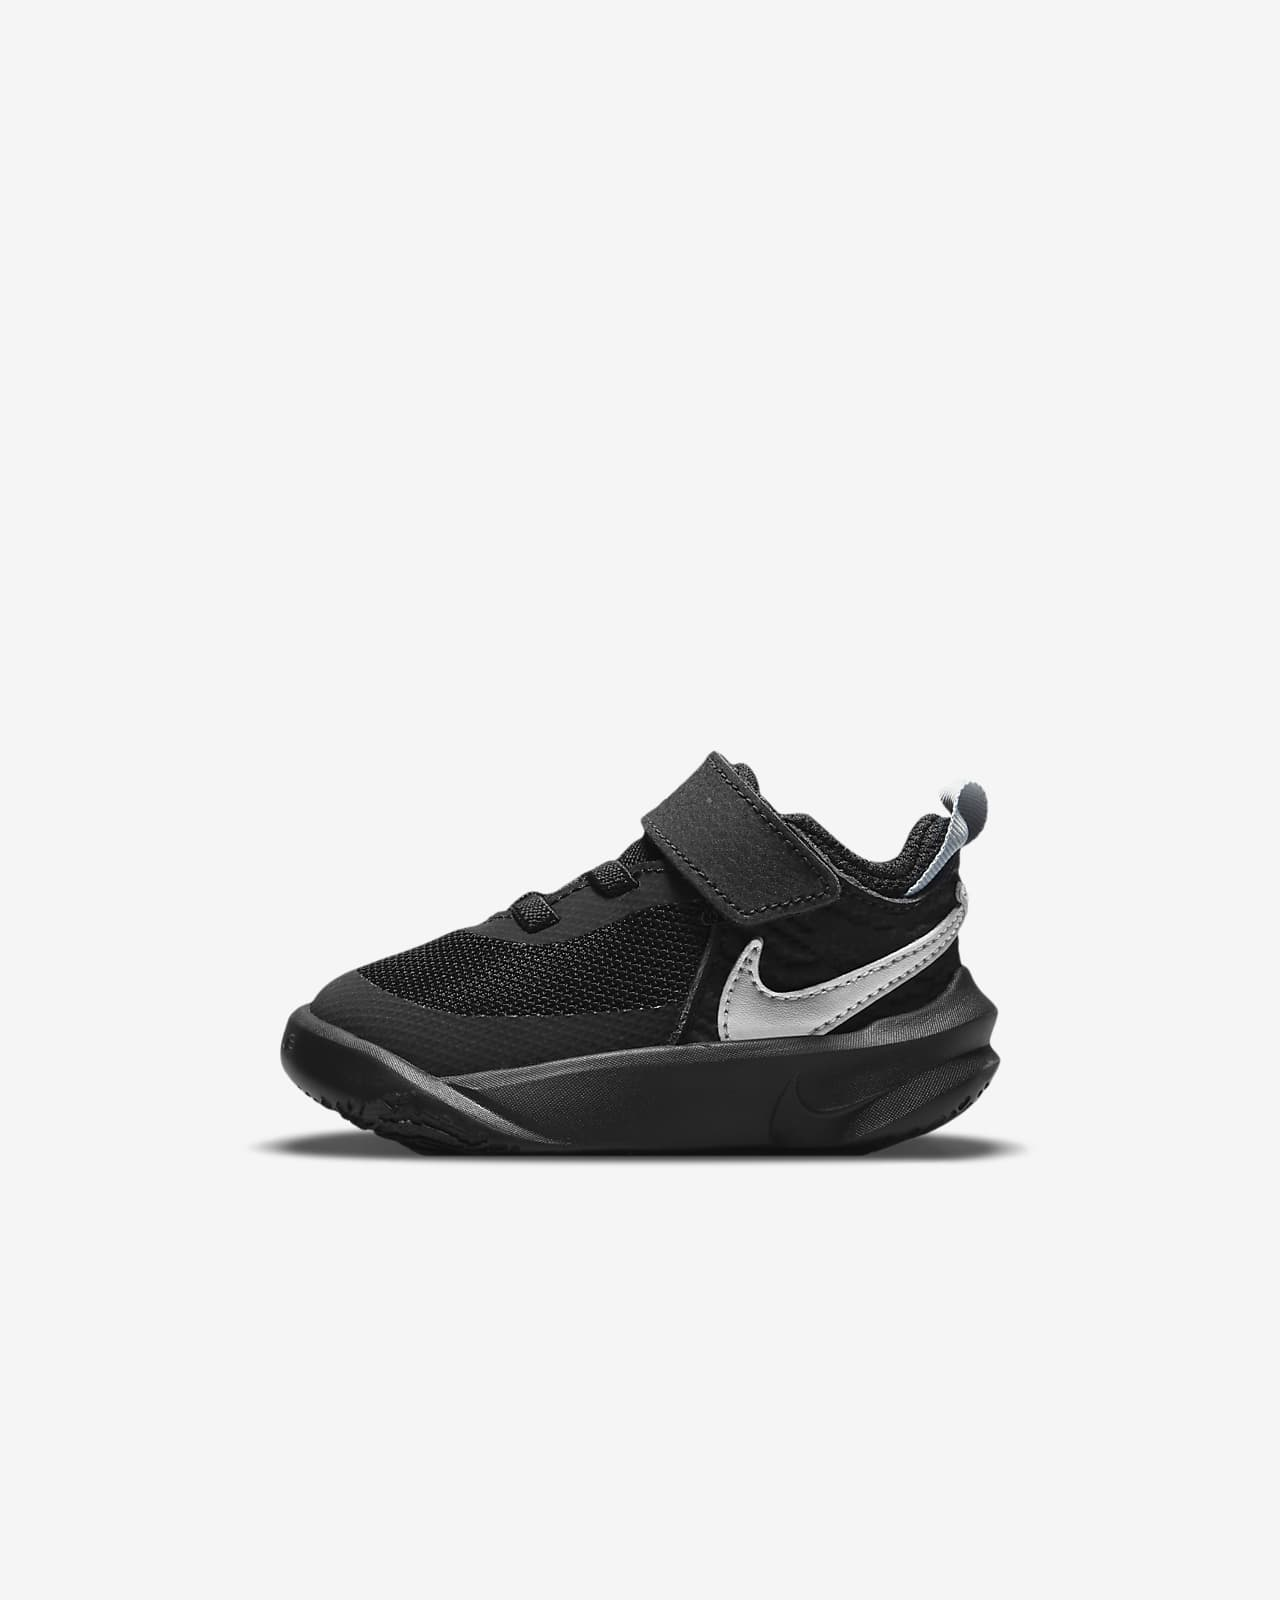 Nike Team Hustle D 10 Baby/Toddler Shoes